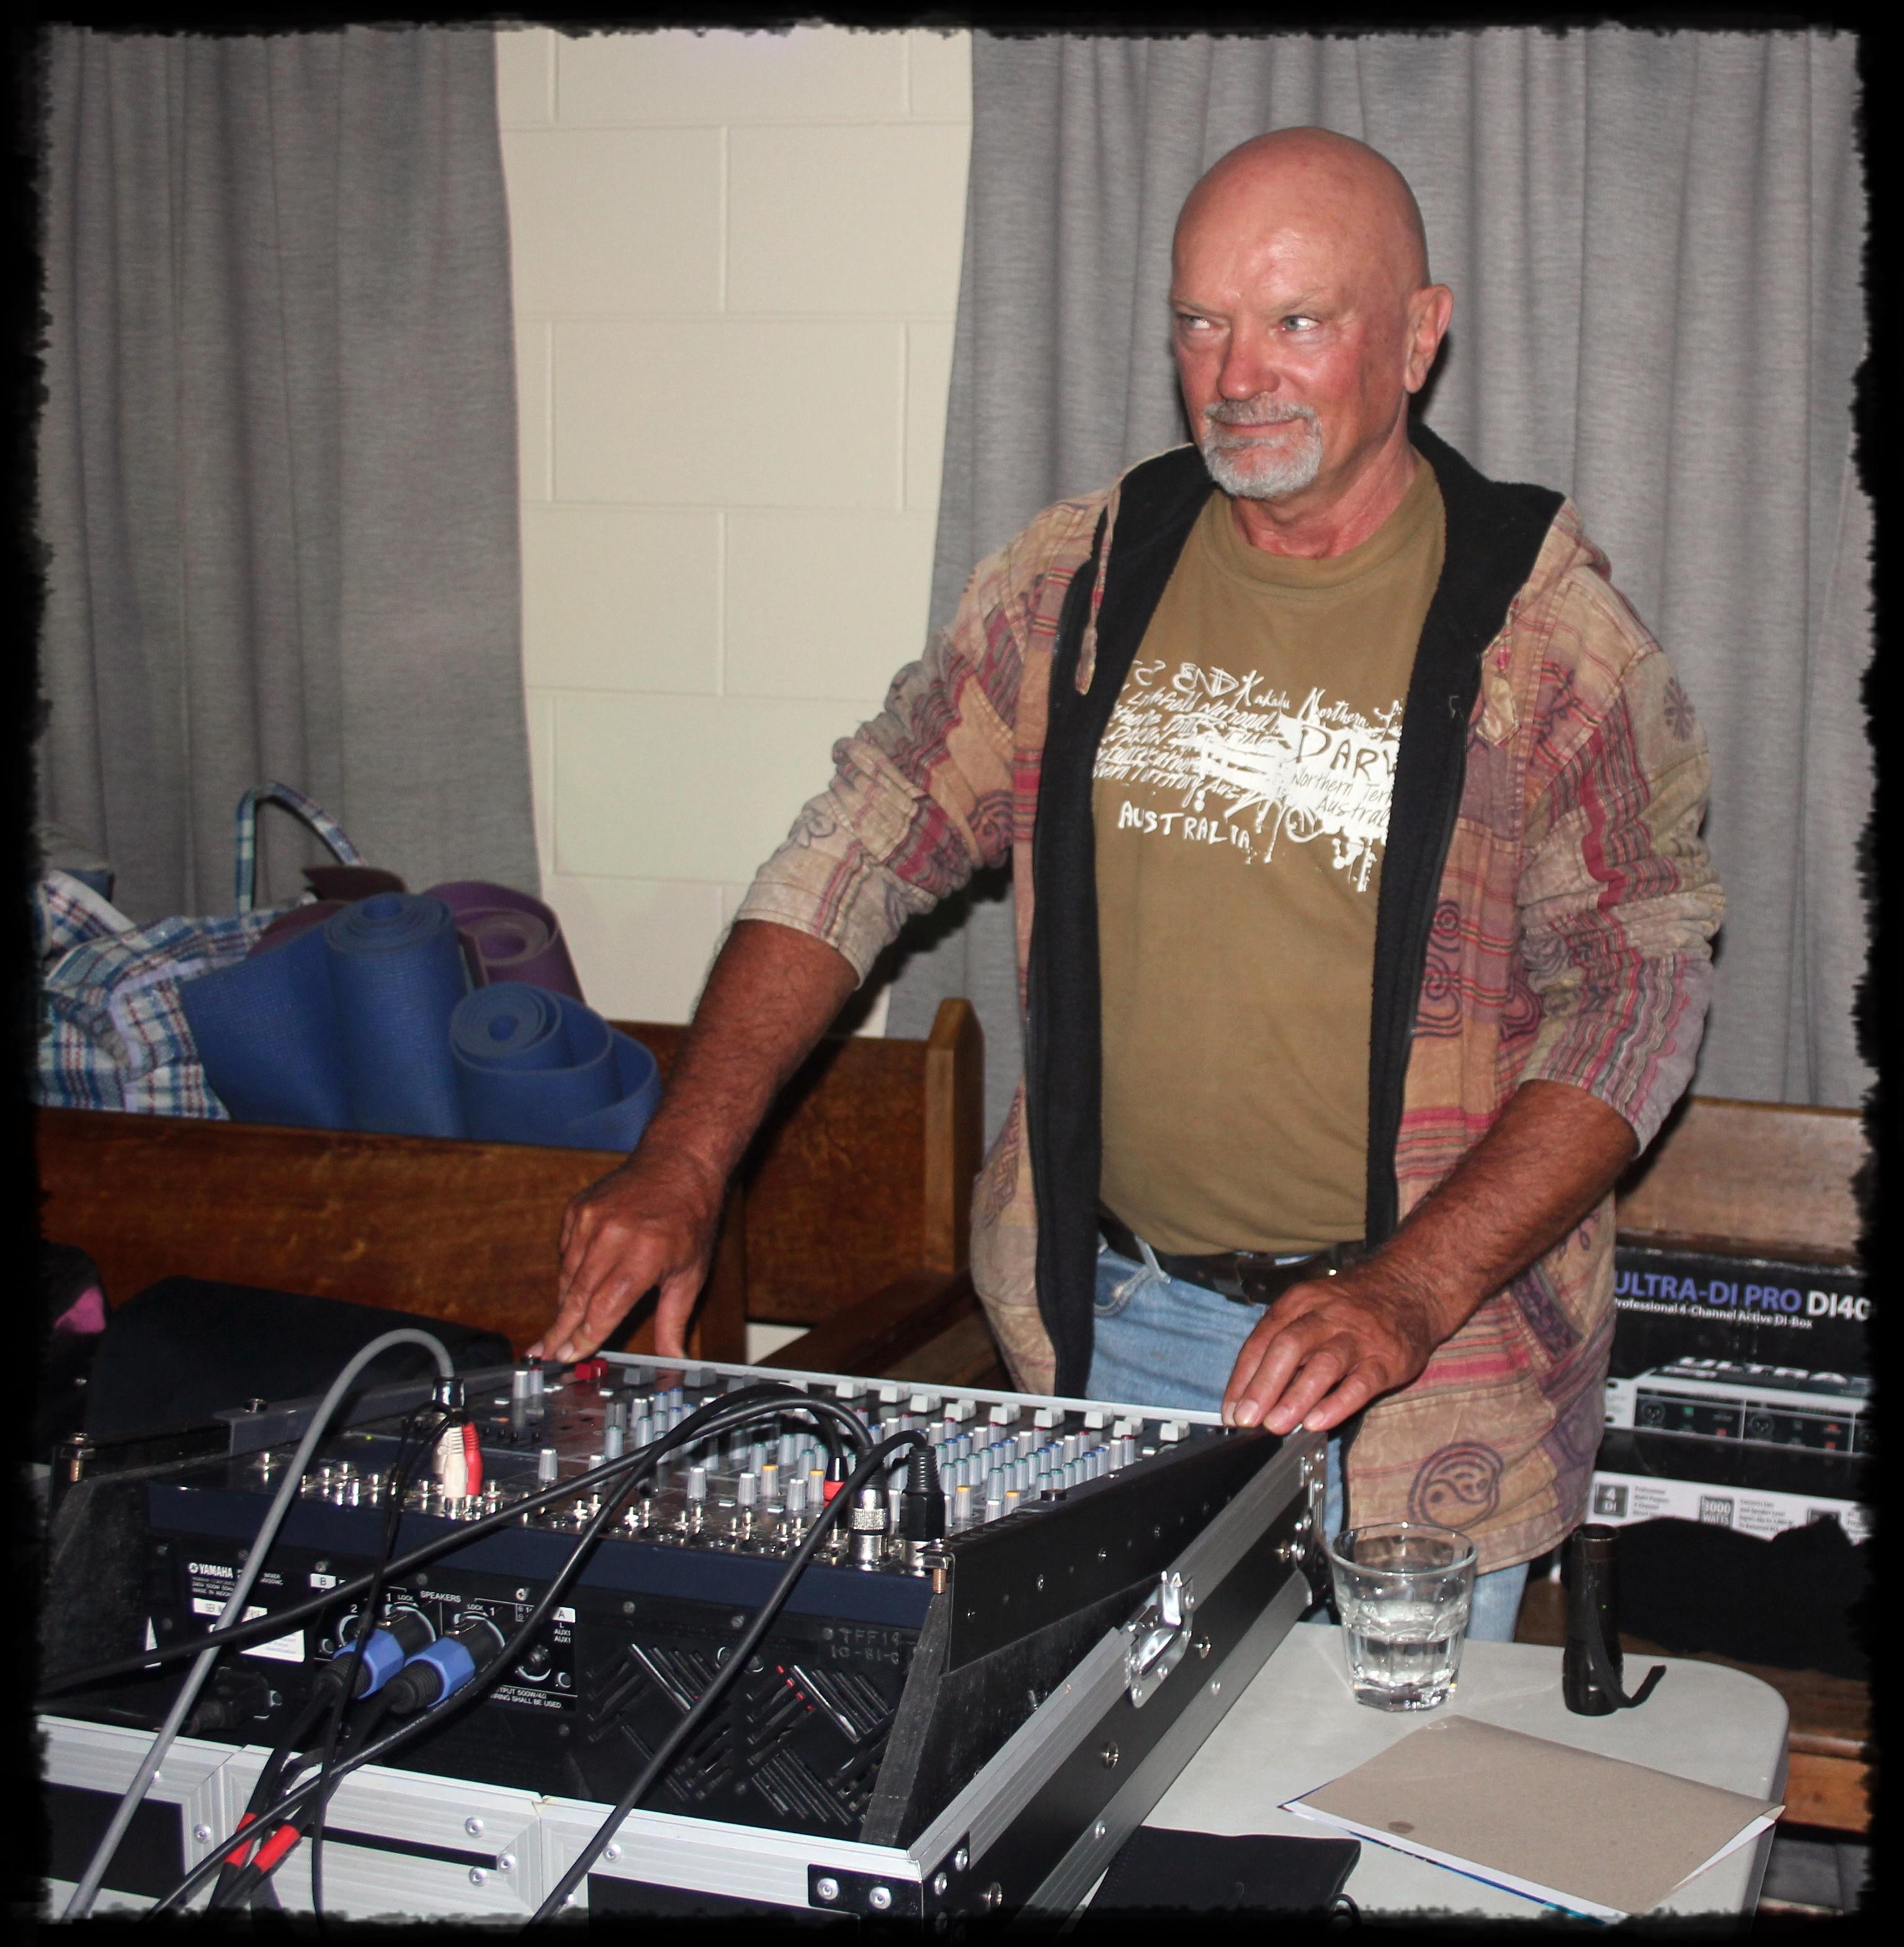 Steve the Sound Whiz